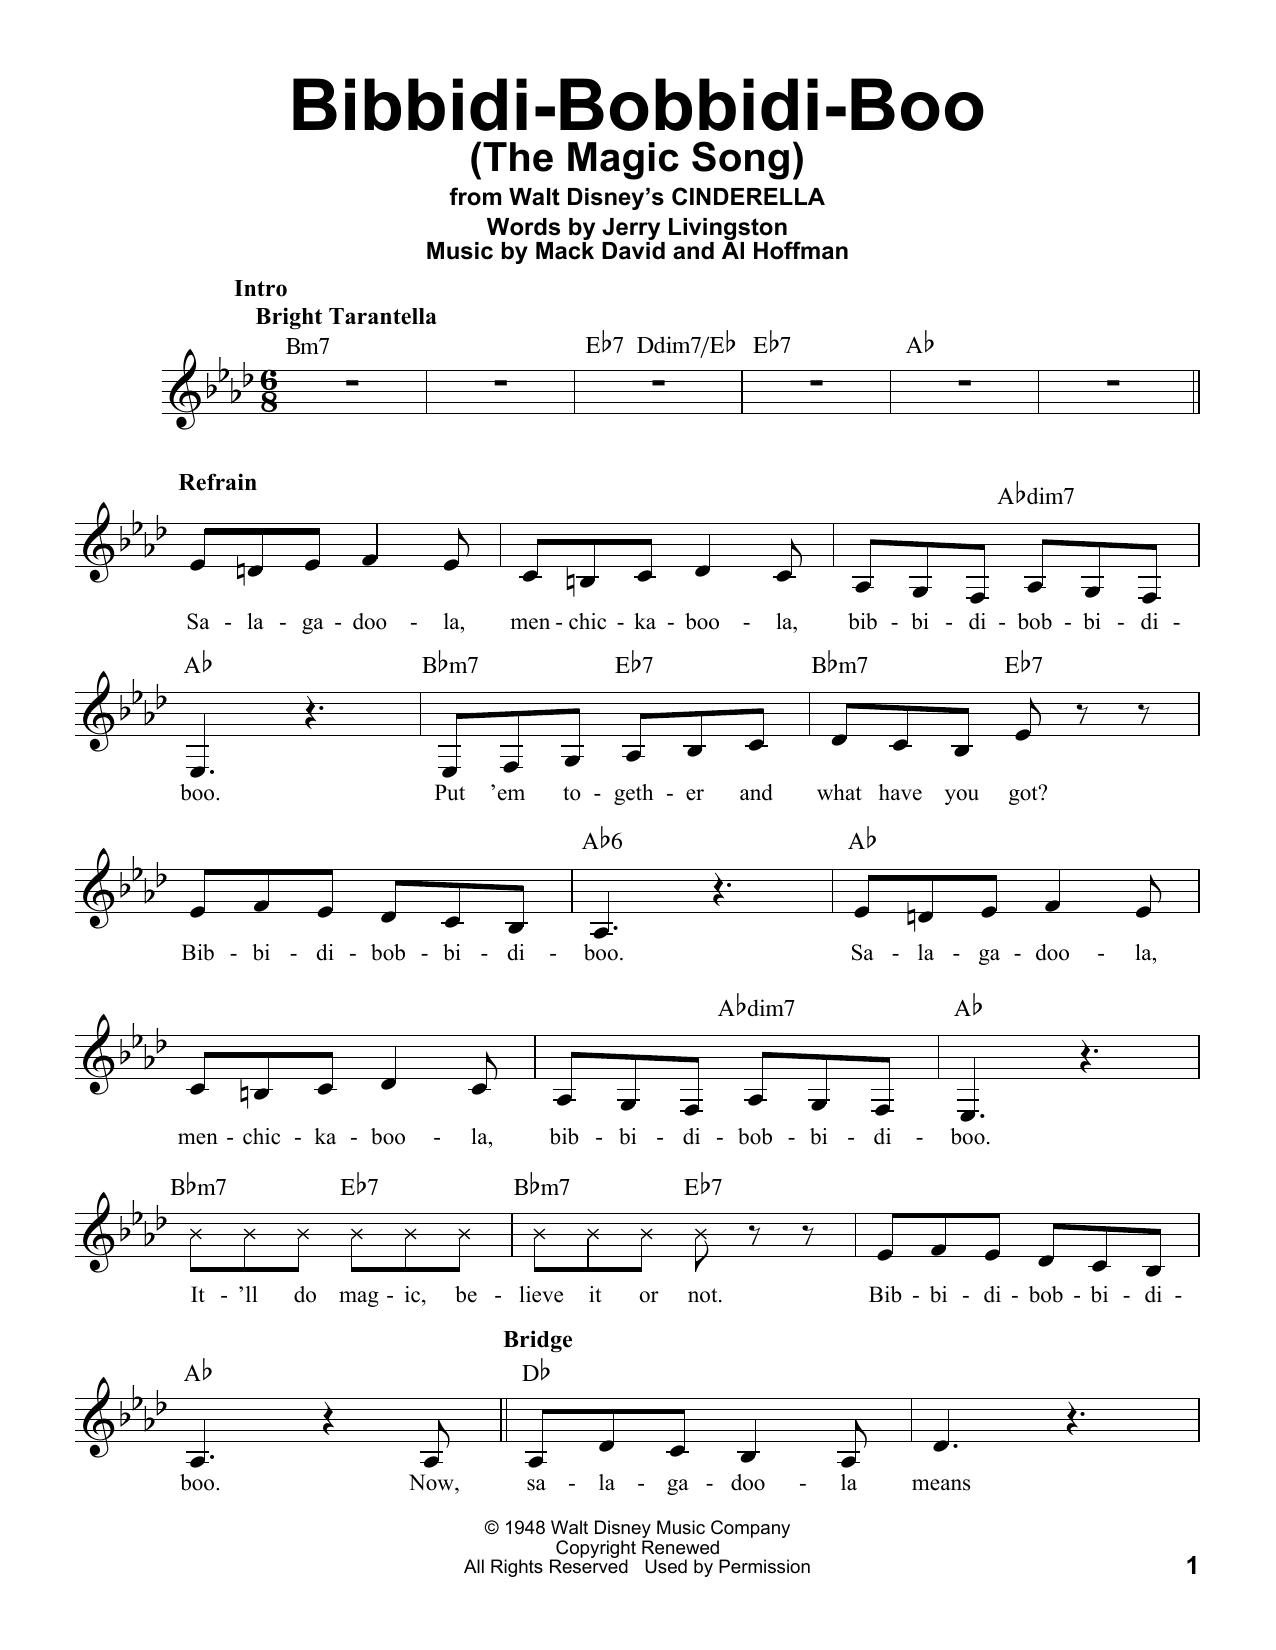 Bibbidi-Bobbidi-Boo (The Magic Song) Sheet Music